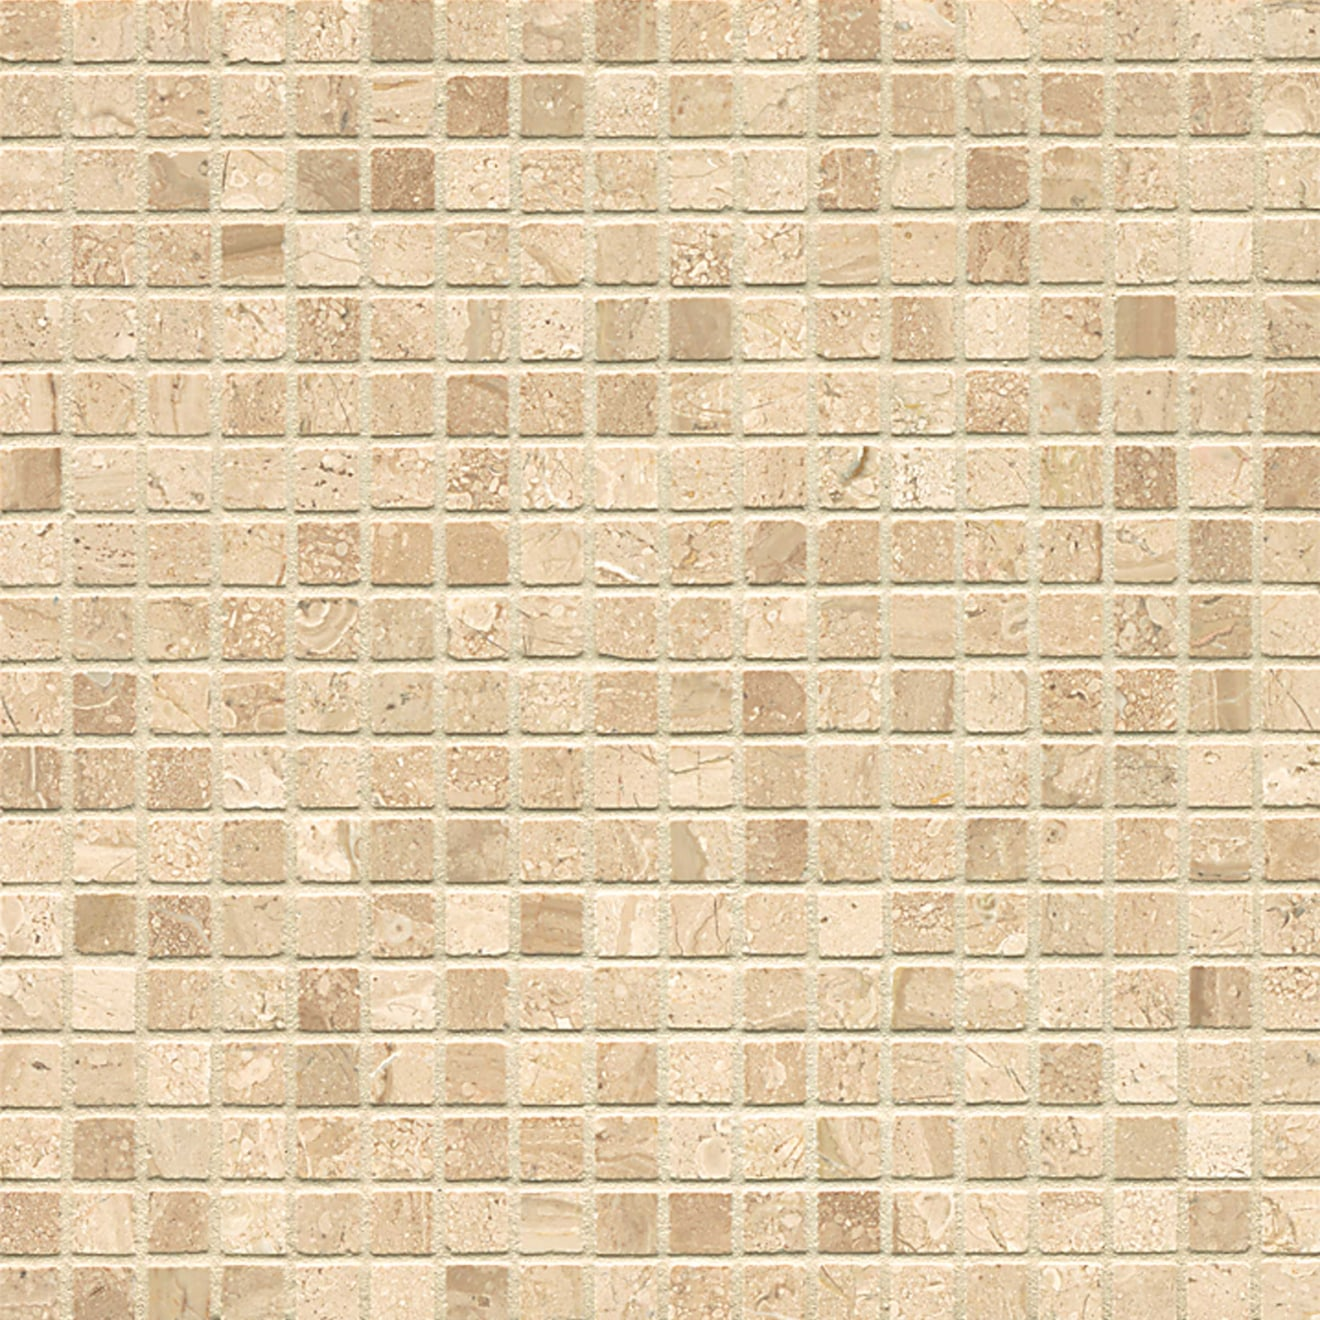 5/8X5/8 Mod Rocks Mosaic-Chantarell